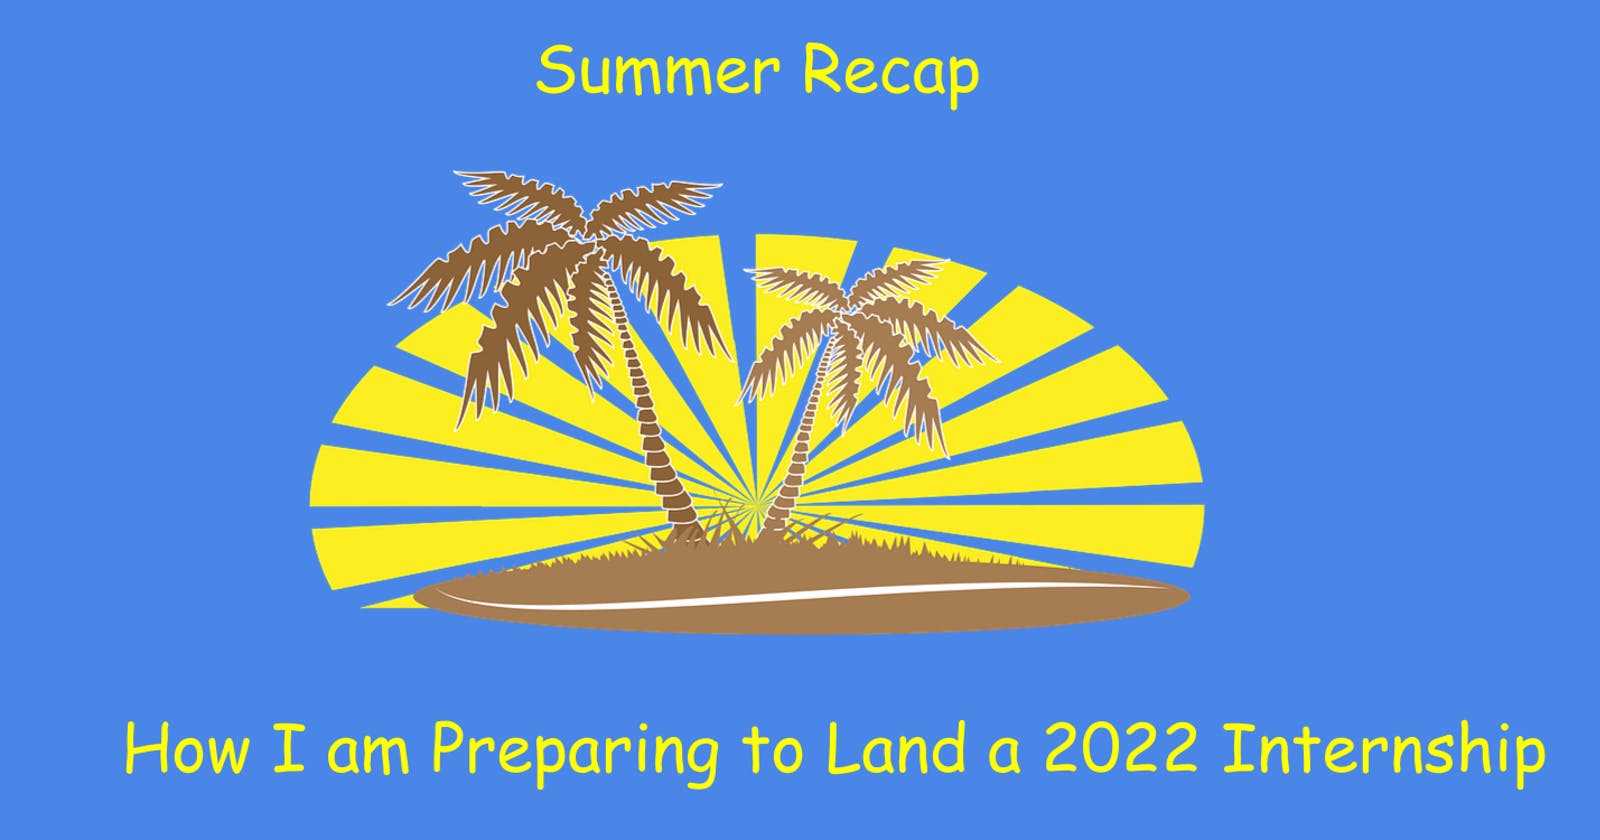 Summer Recap - How I am Preparing to Land a Summer 2022 Internship